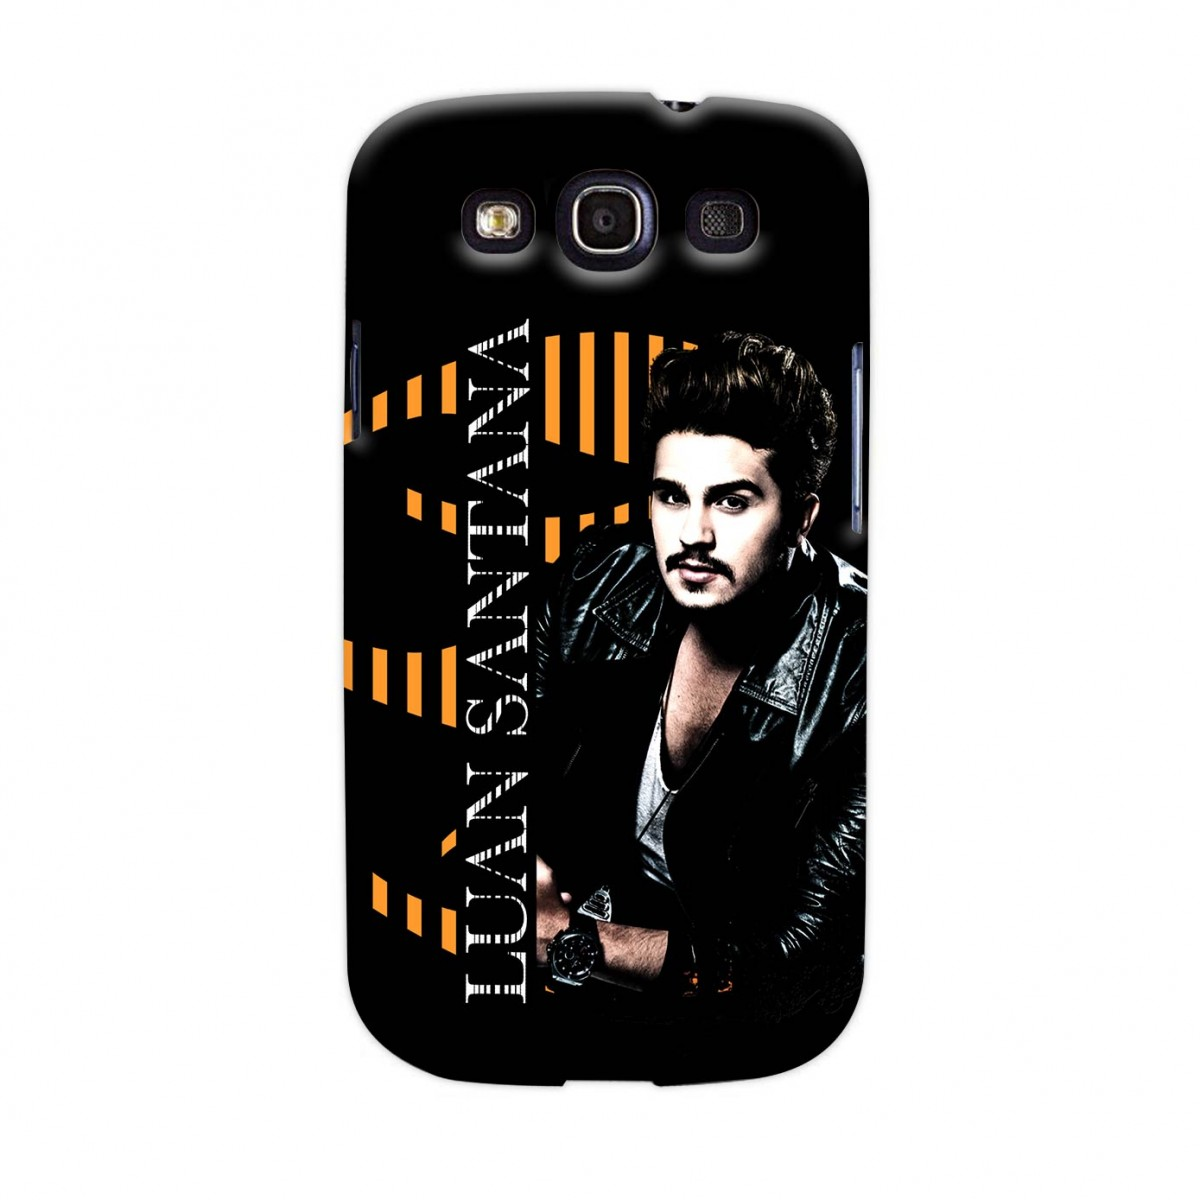 Capa de Celular Samsung Galaxy S3 Luan Santana Type